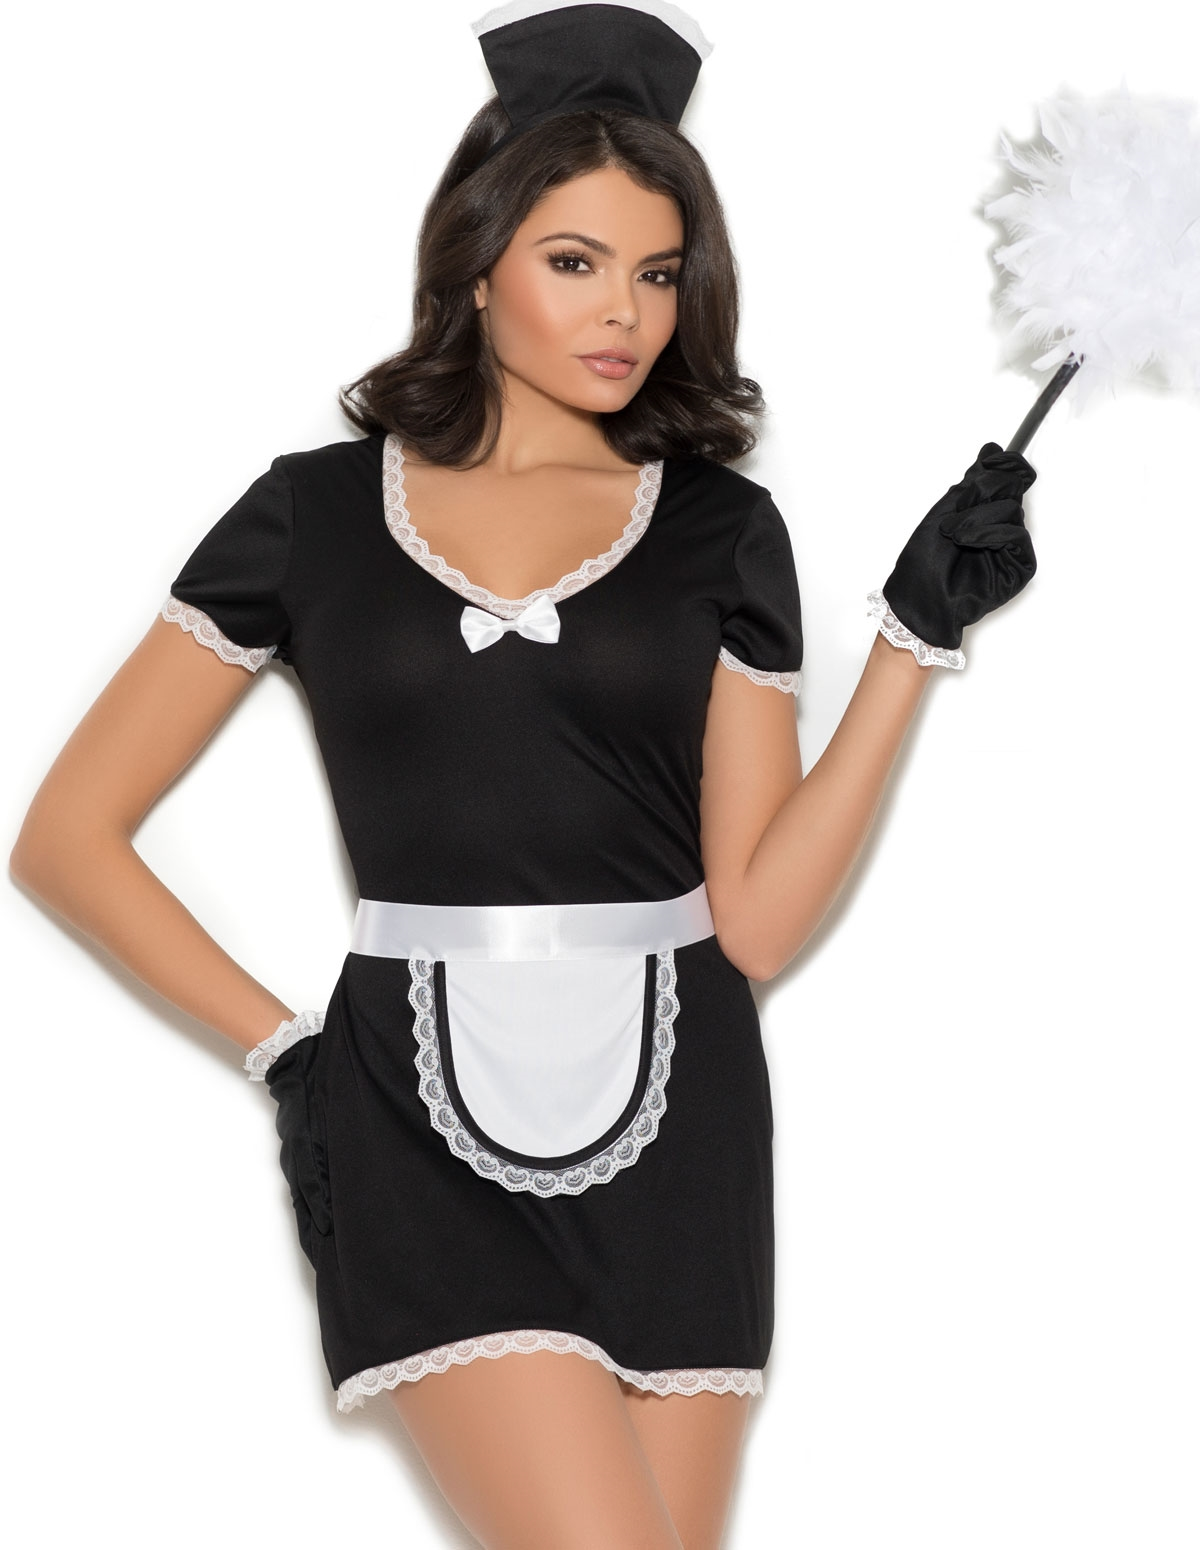 Flirty Maid